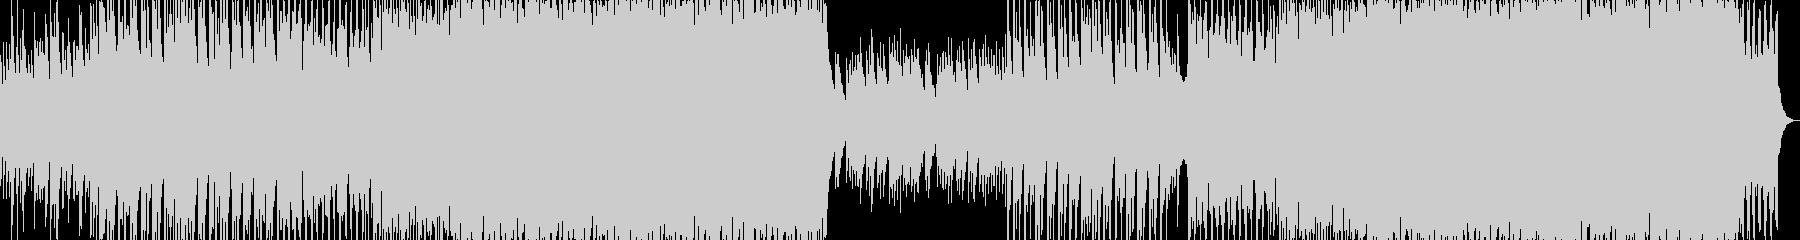 Japanese style EDM of cute koto's unreproduced waveform